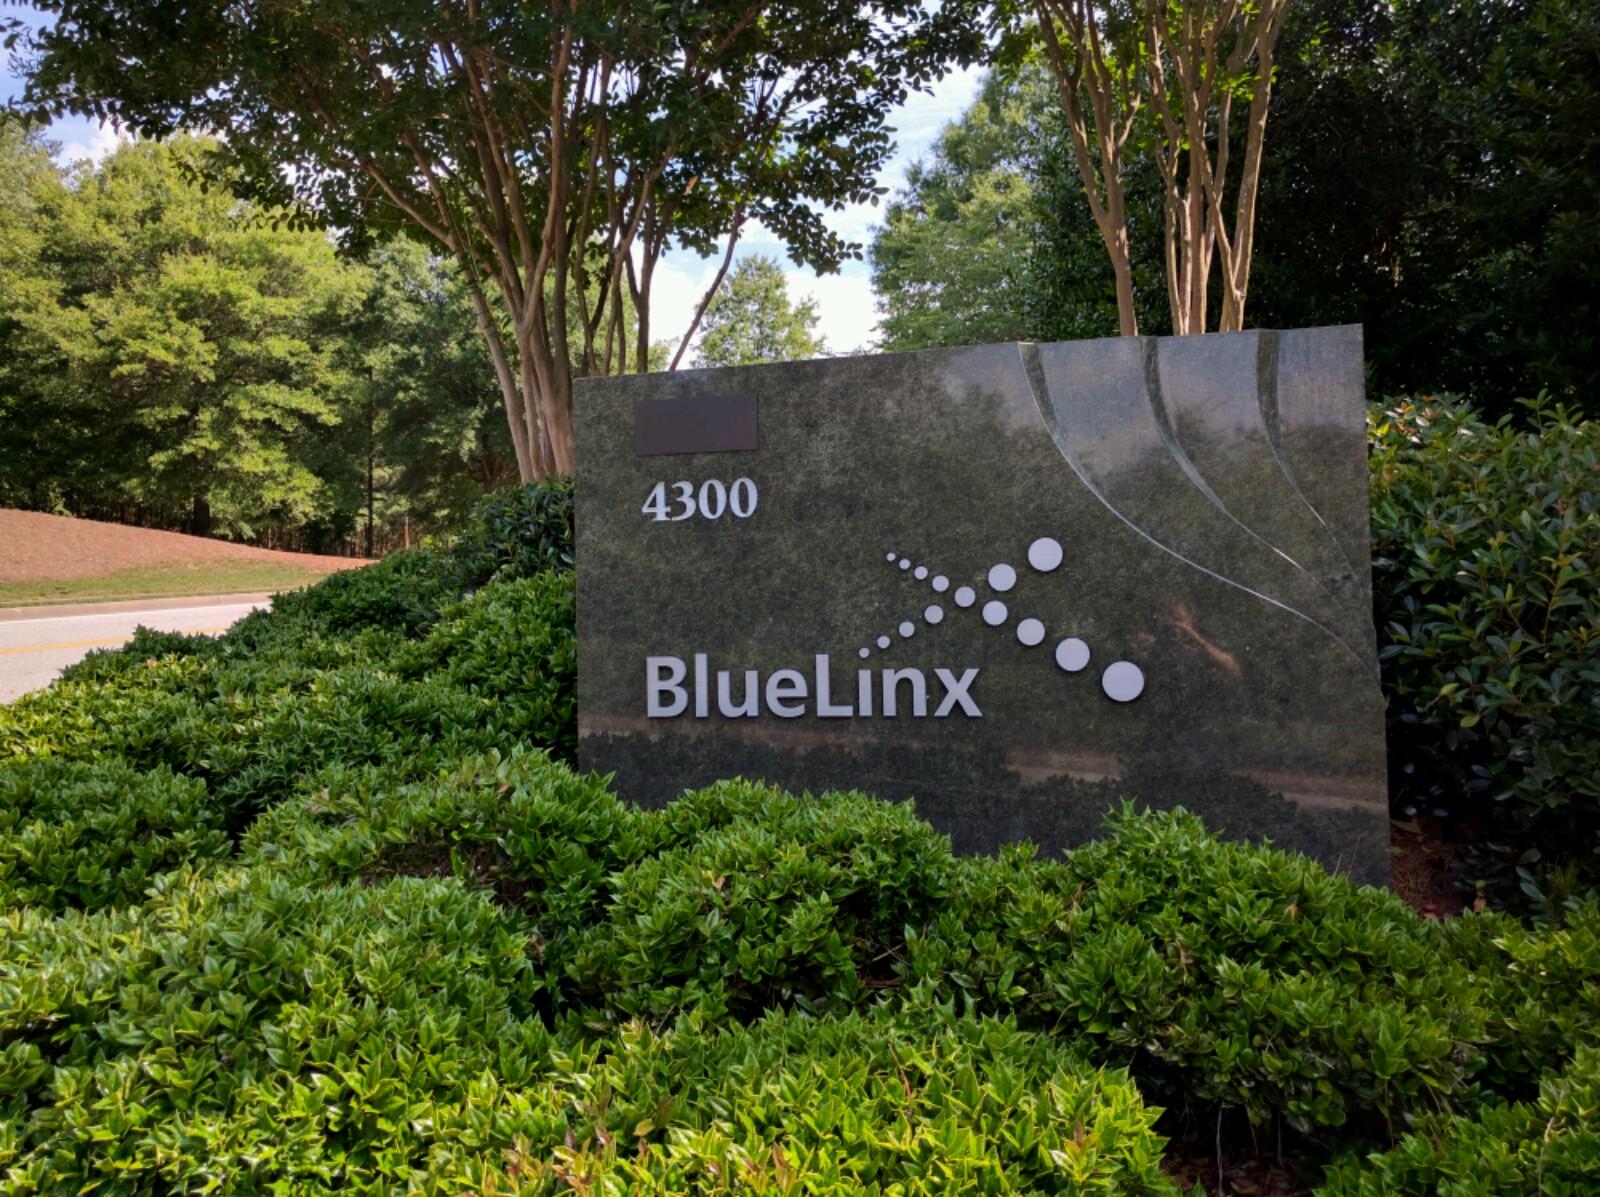 Entrance to BlueLinx's corporate headquarters in Atlanta, Georgia.